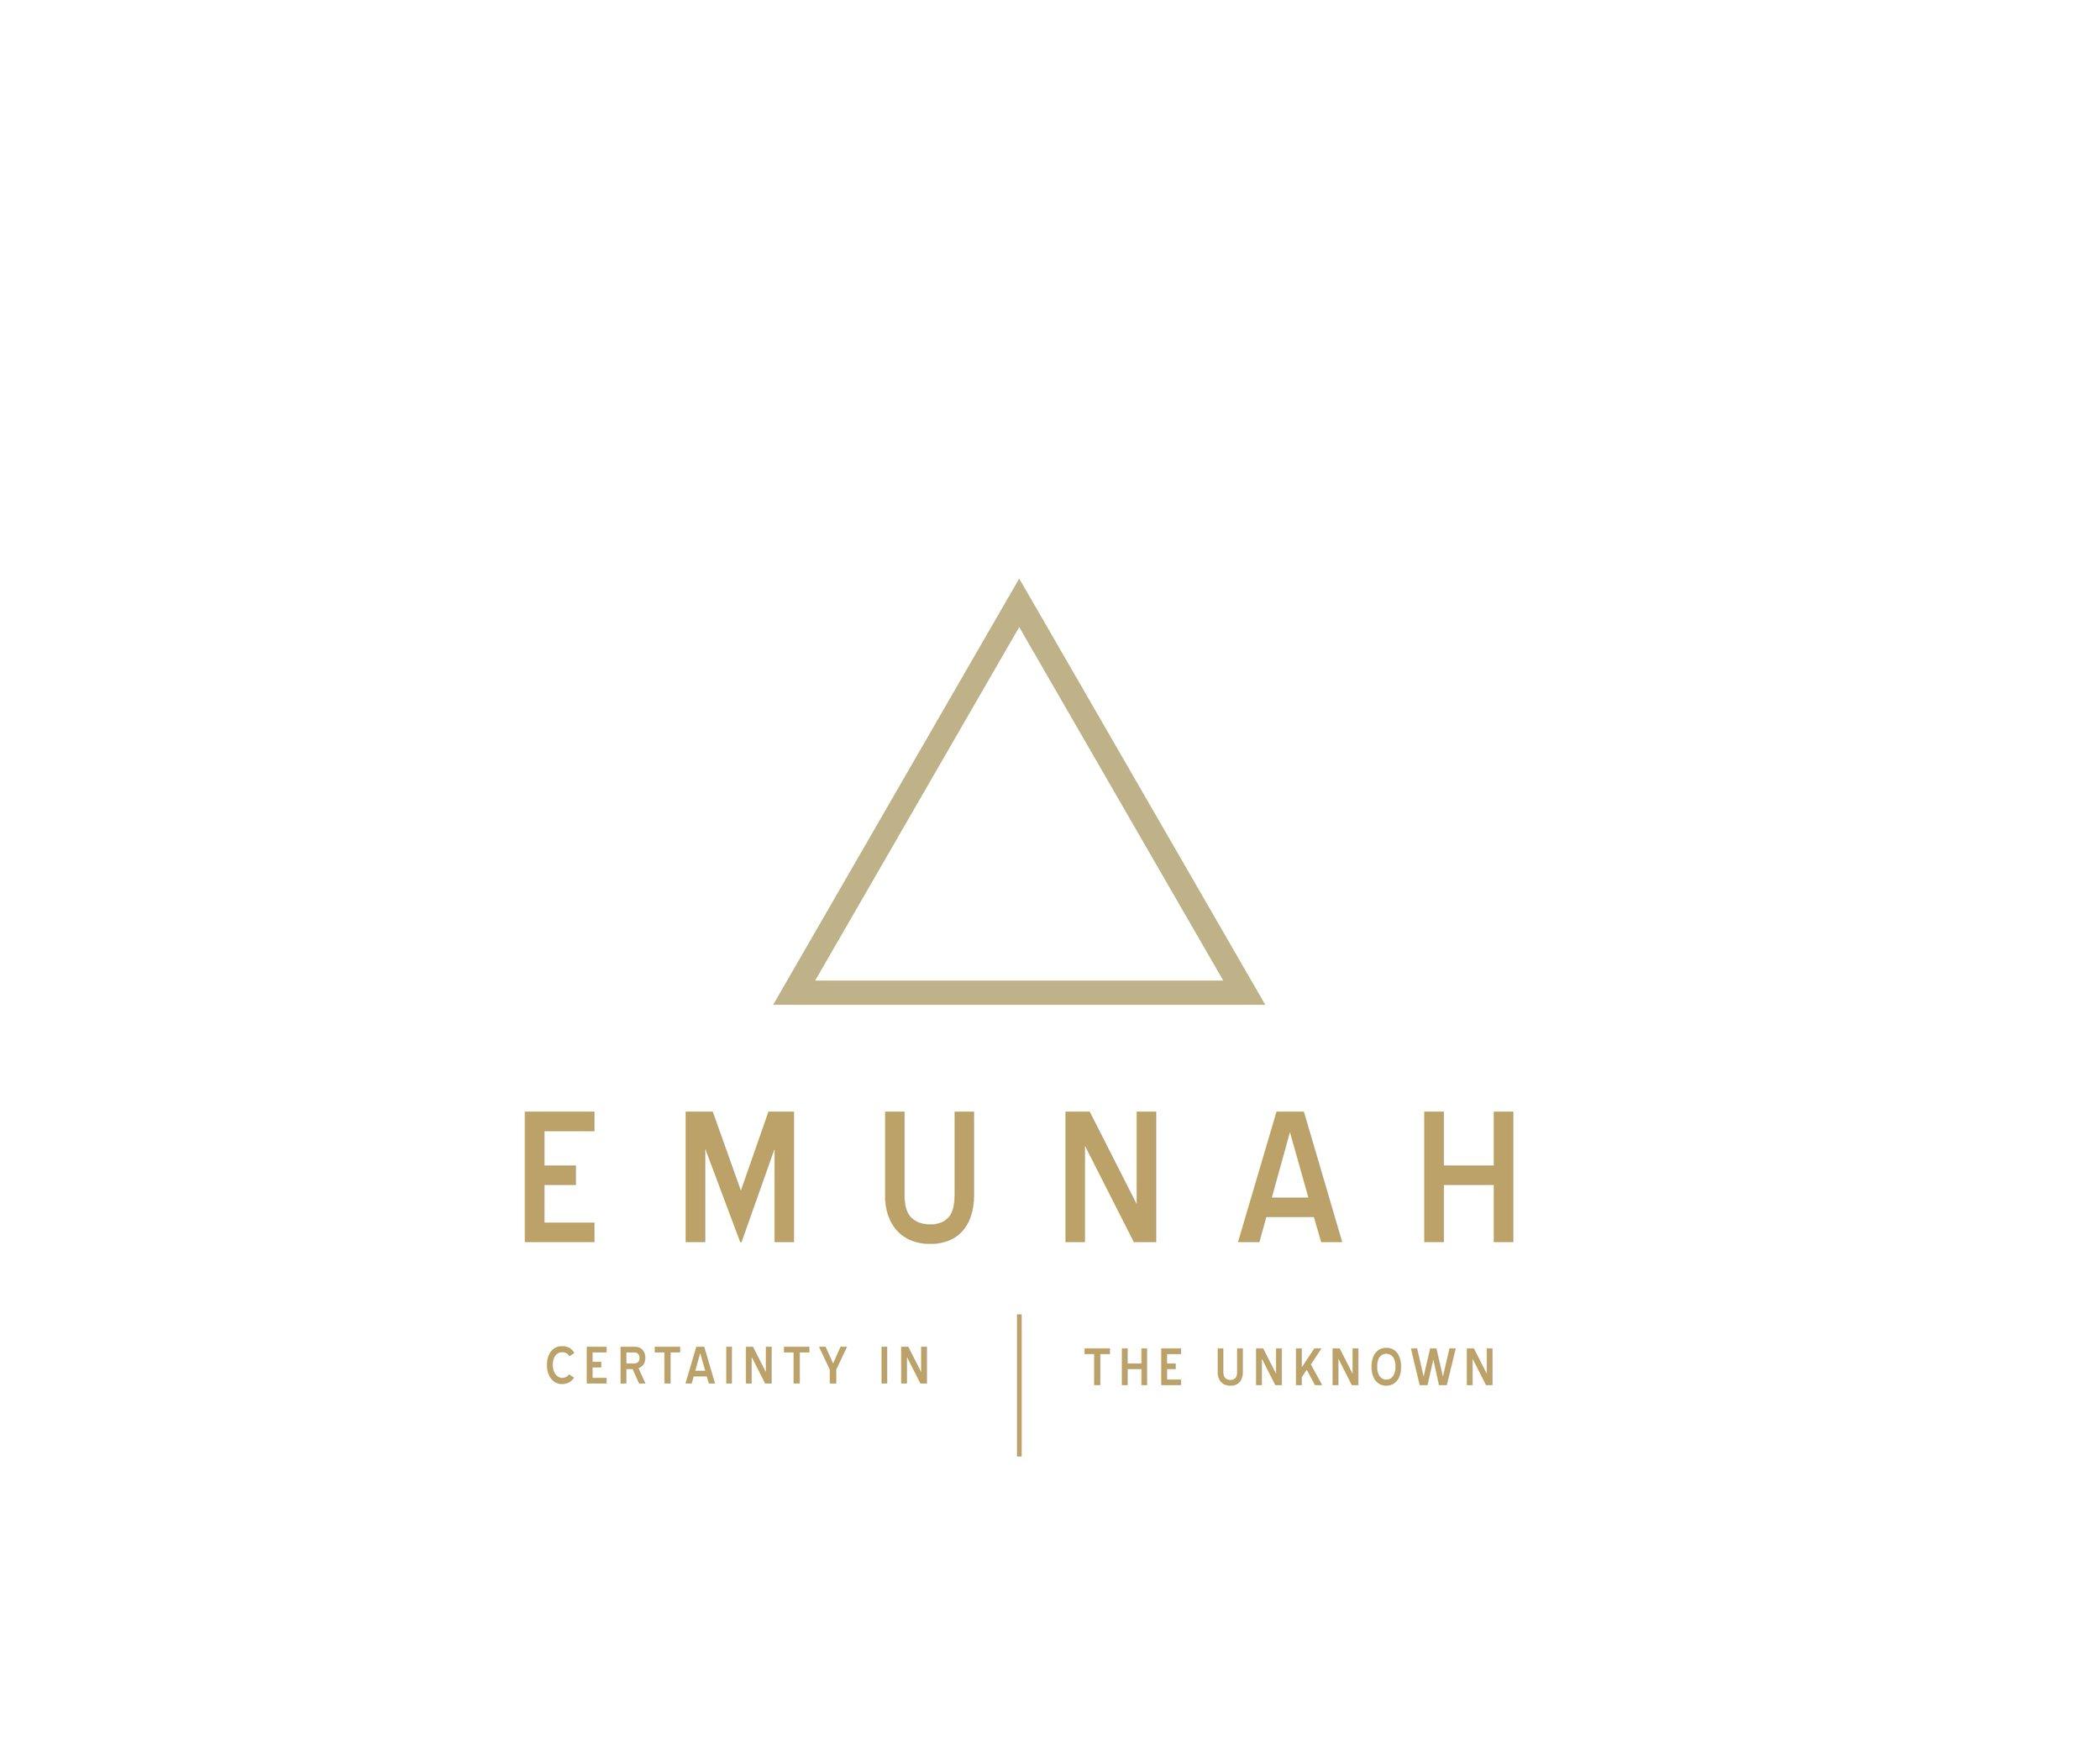 logo type_emunah_2.jpg